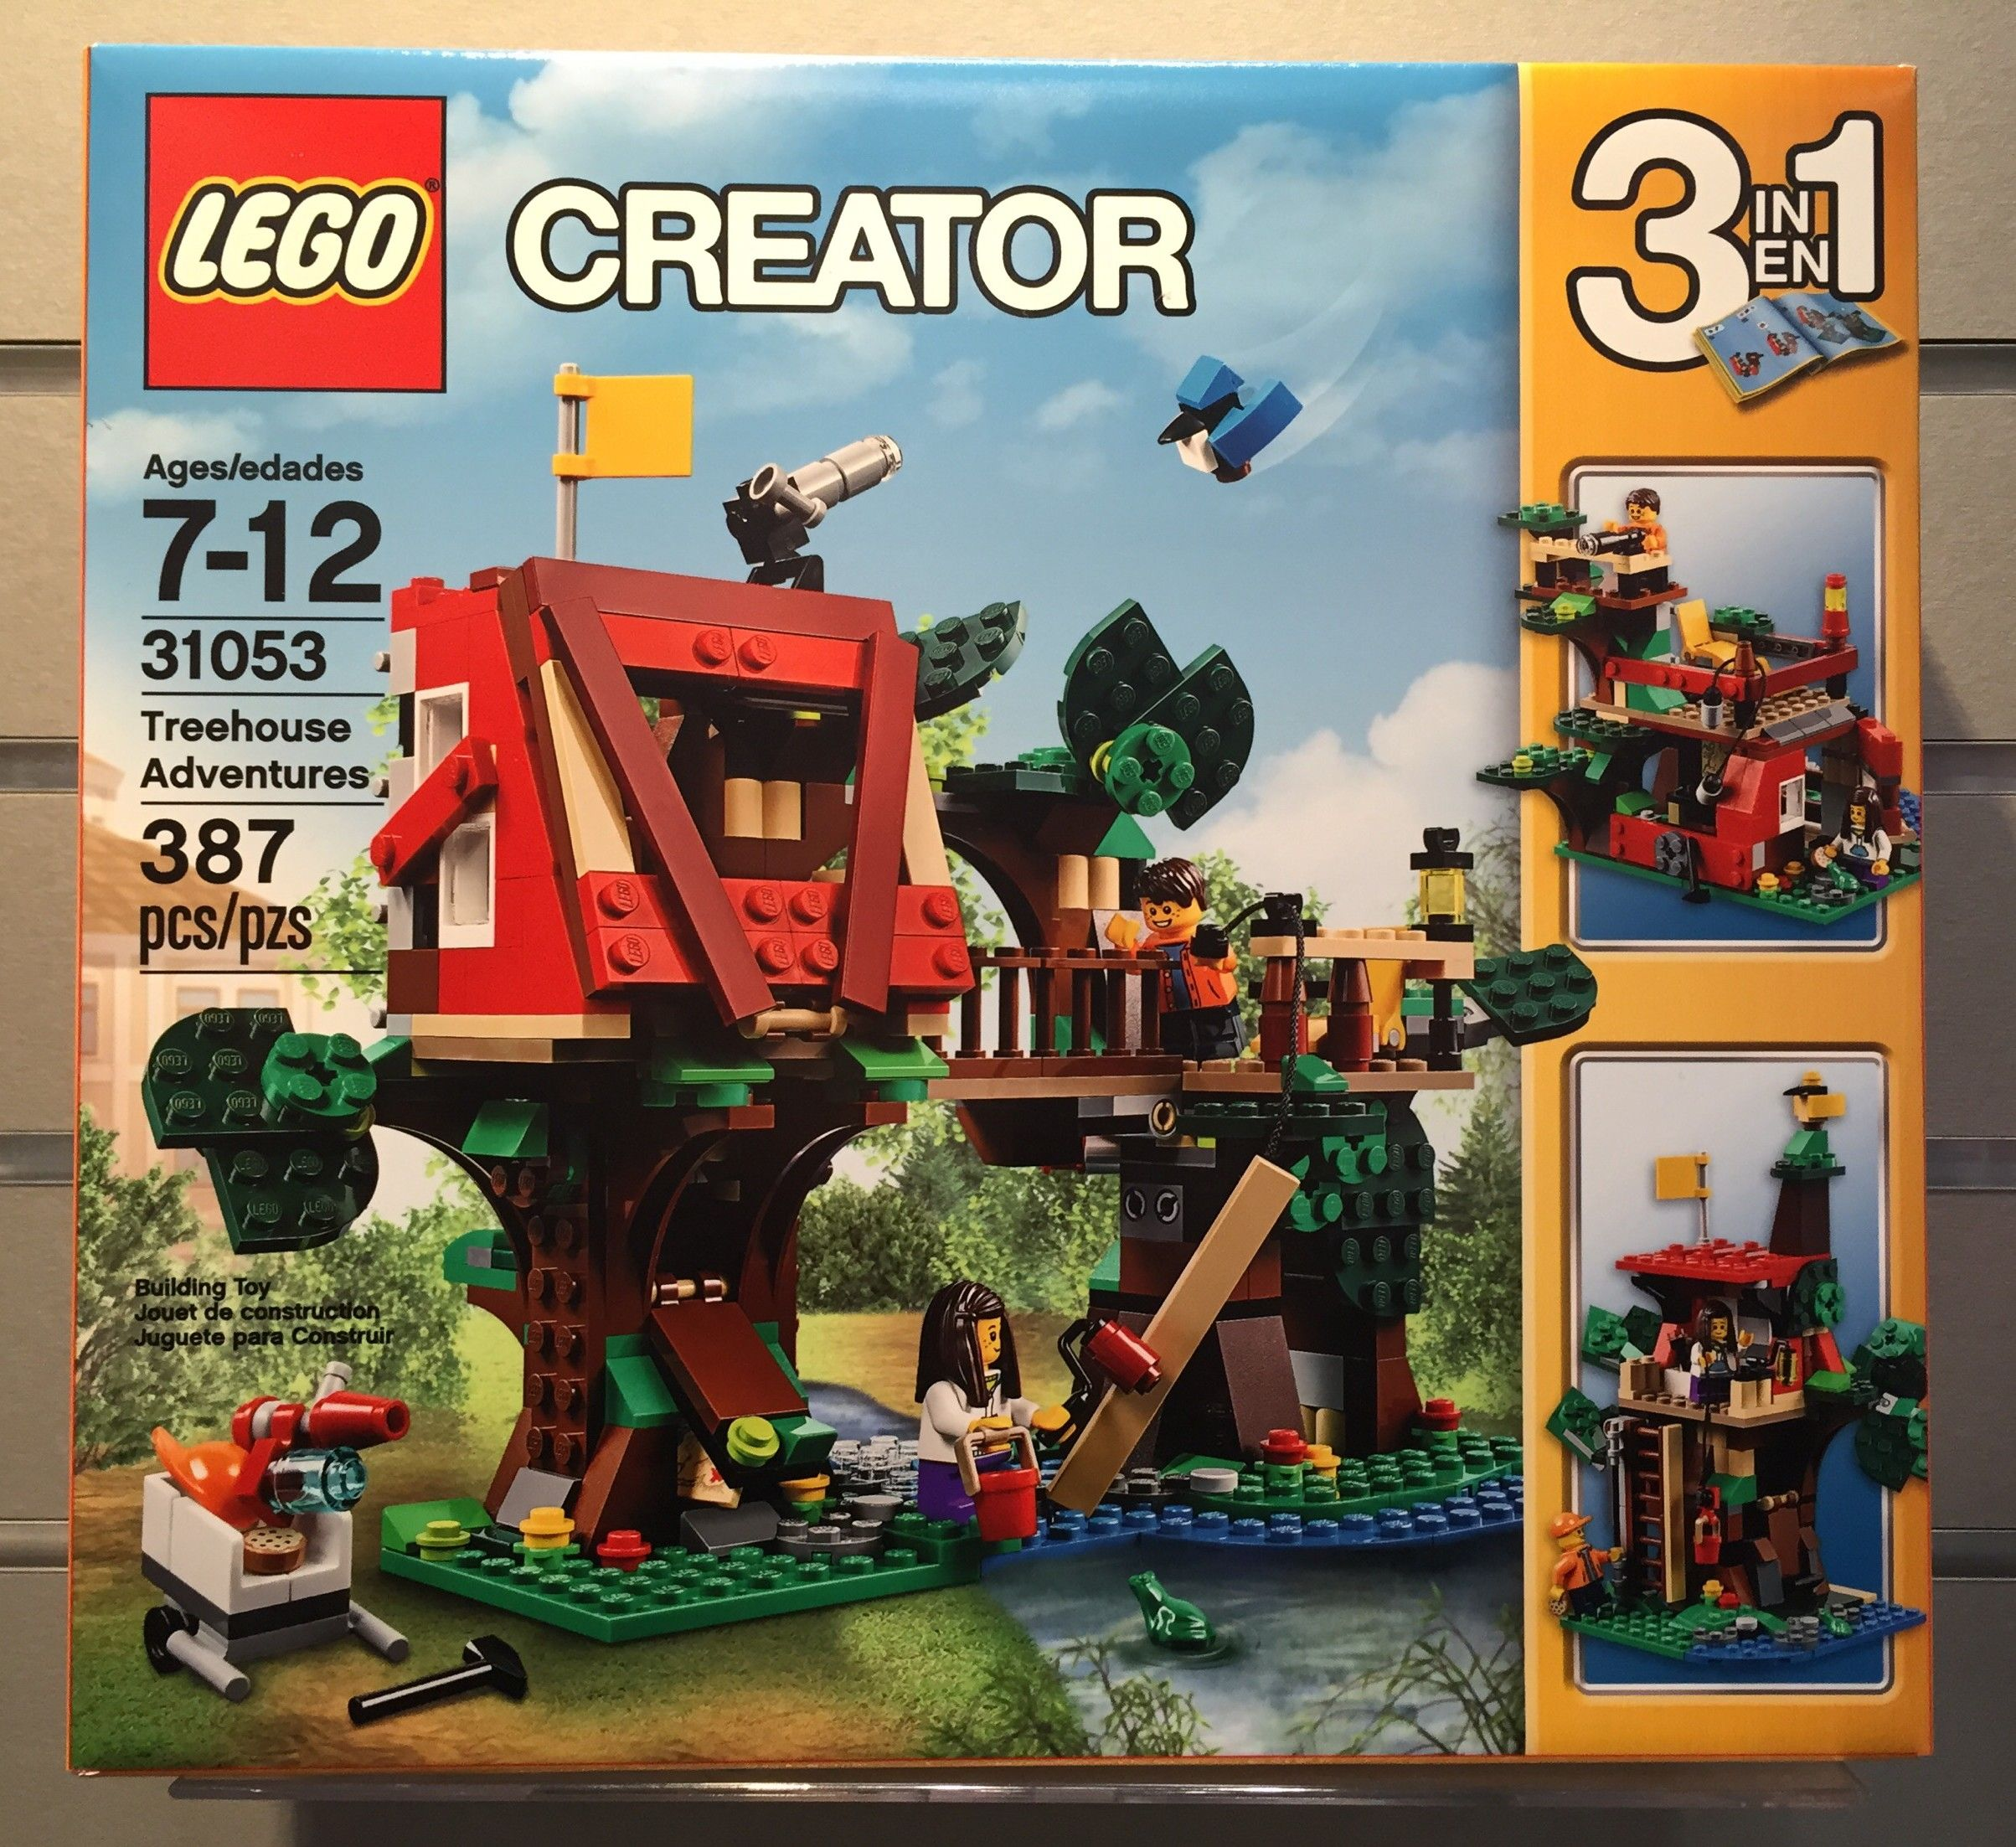 31053 treehouse adventures lego pinterest lego and. Black Bedroom Furniture Sets. Home Design Ideas